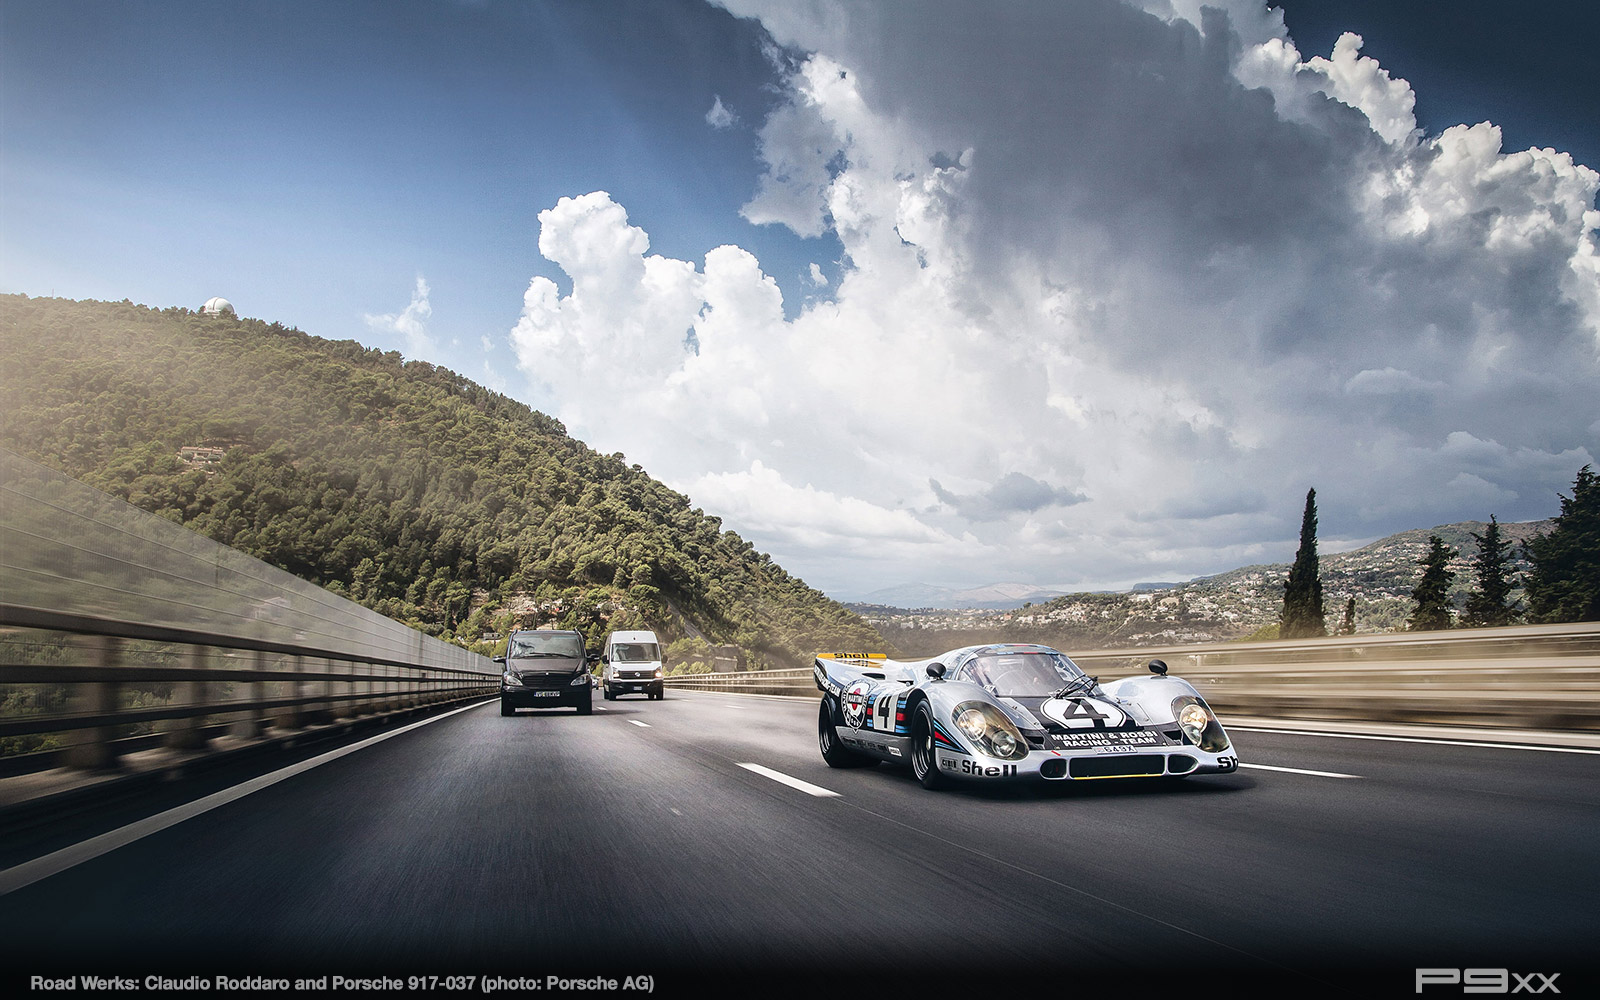 Porsche-917-037-Martini-Racing-Monaco-2018-304